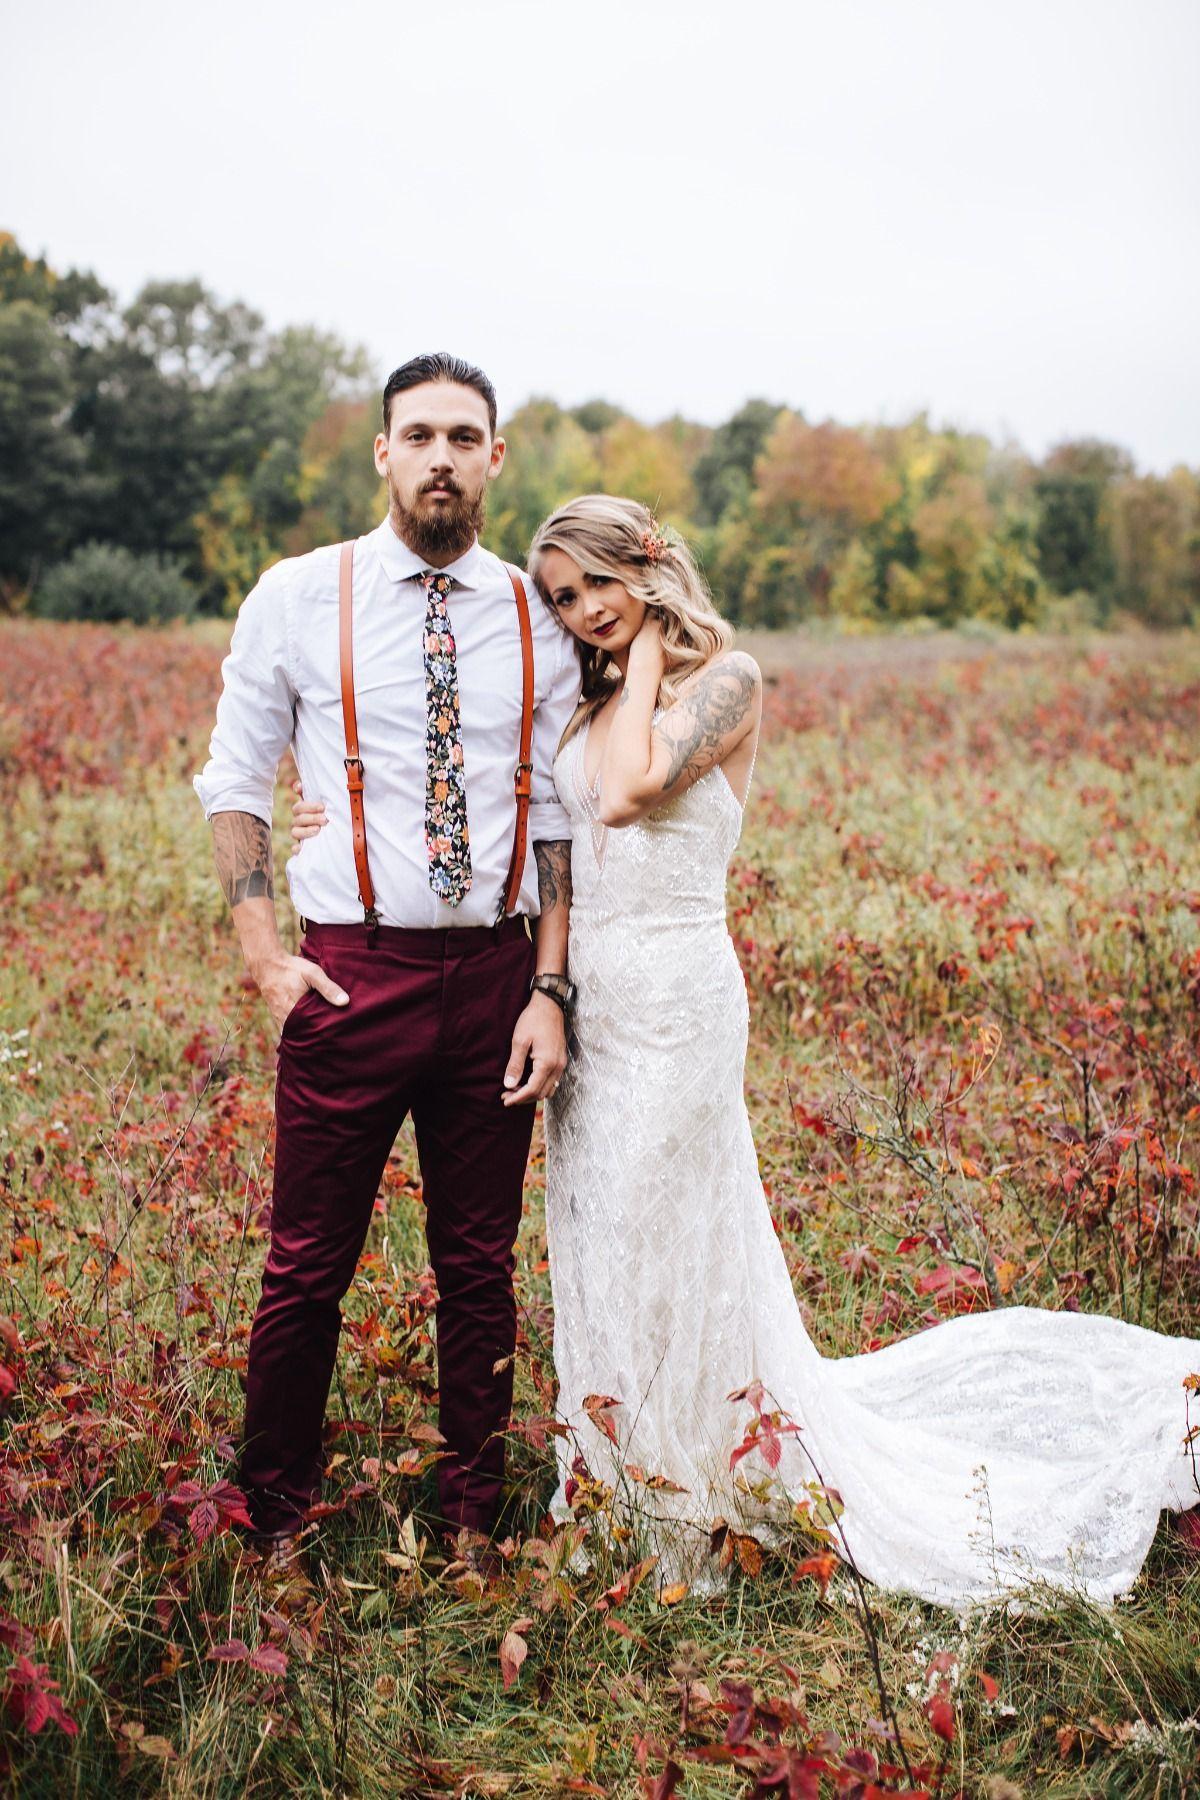 A Dreamy Fall Bohemian Wedding In Michigan | Fall wedding photos, Fall  wedding gowns, Bohemian wedding